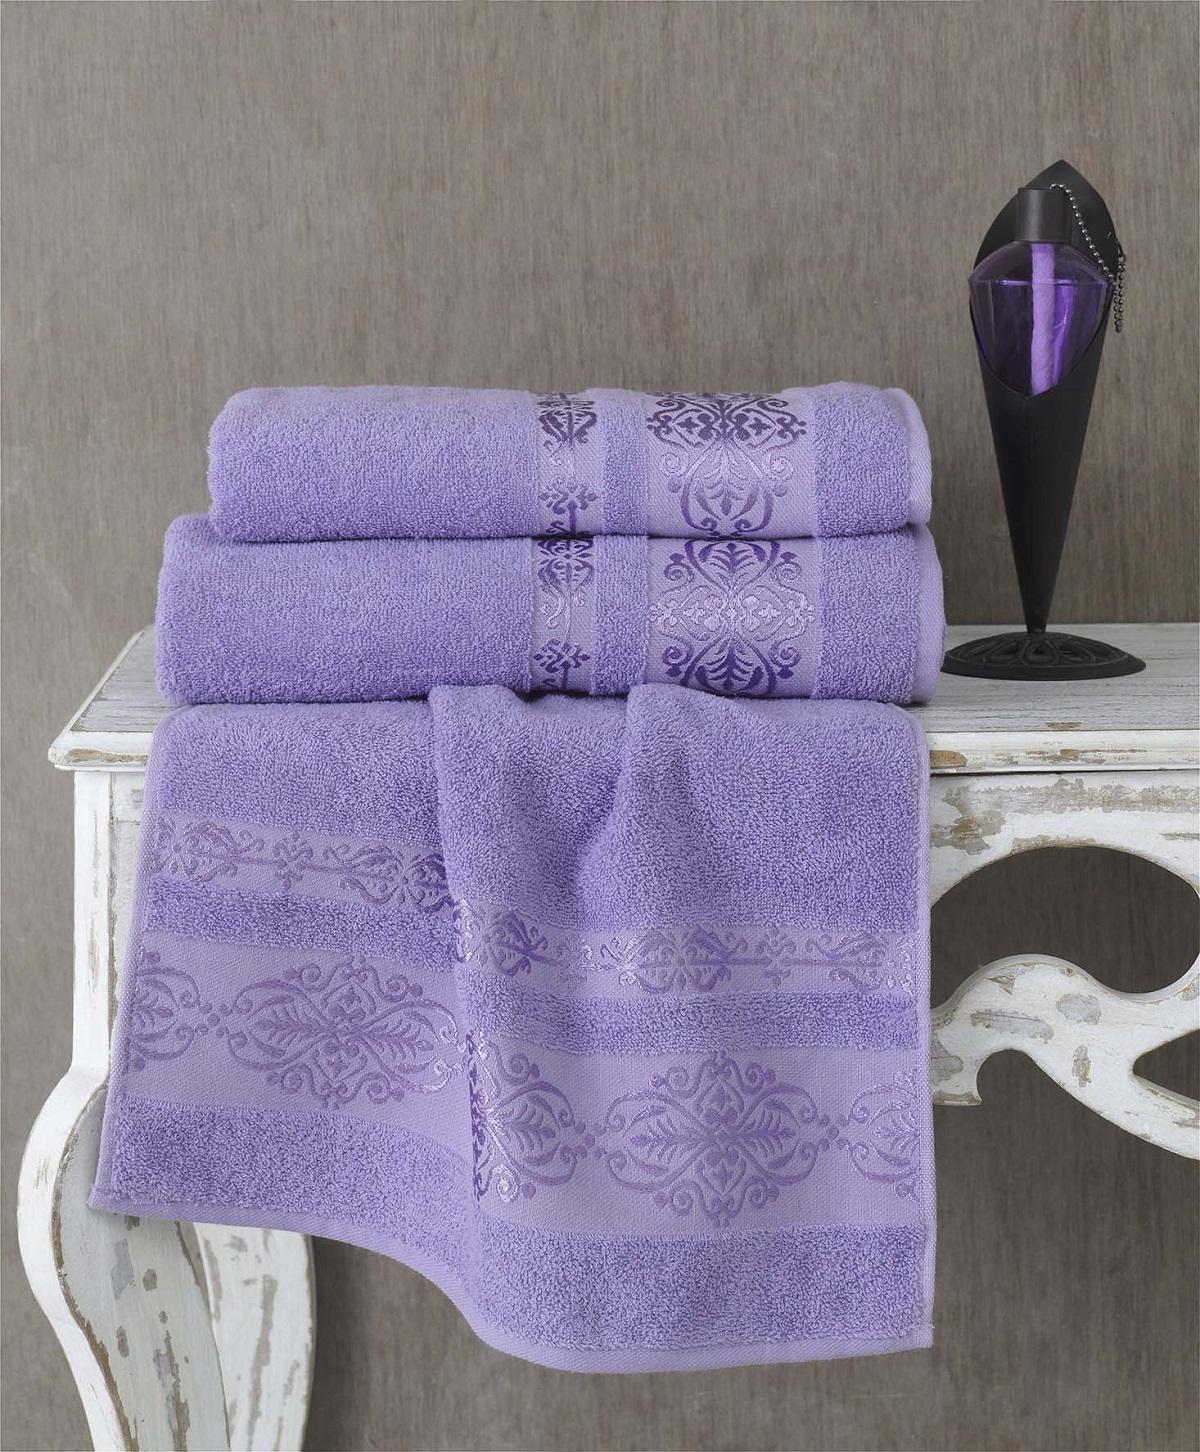 Полотенца Karna Полотенце Rebeka Цвет: Сиреневый (70х140 см) полотенца karna полотенце iteka цвет коричневый 70х140 см